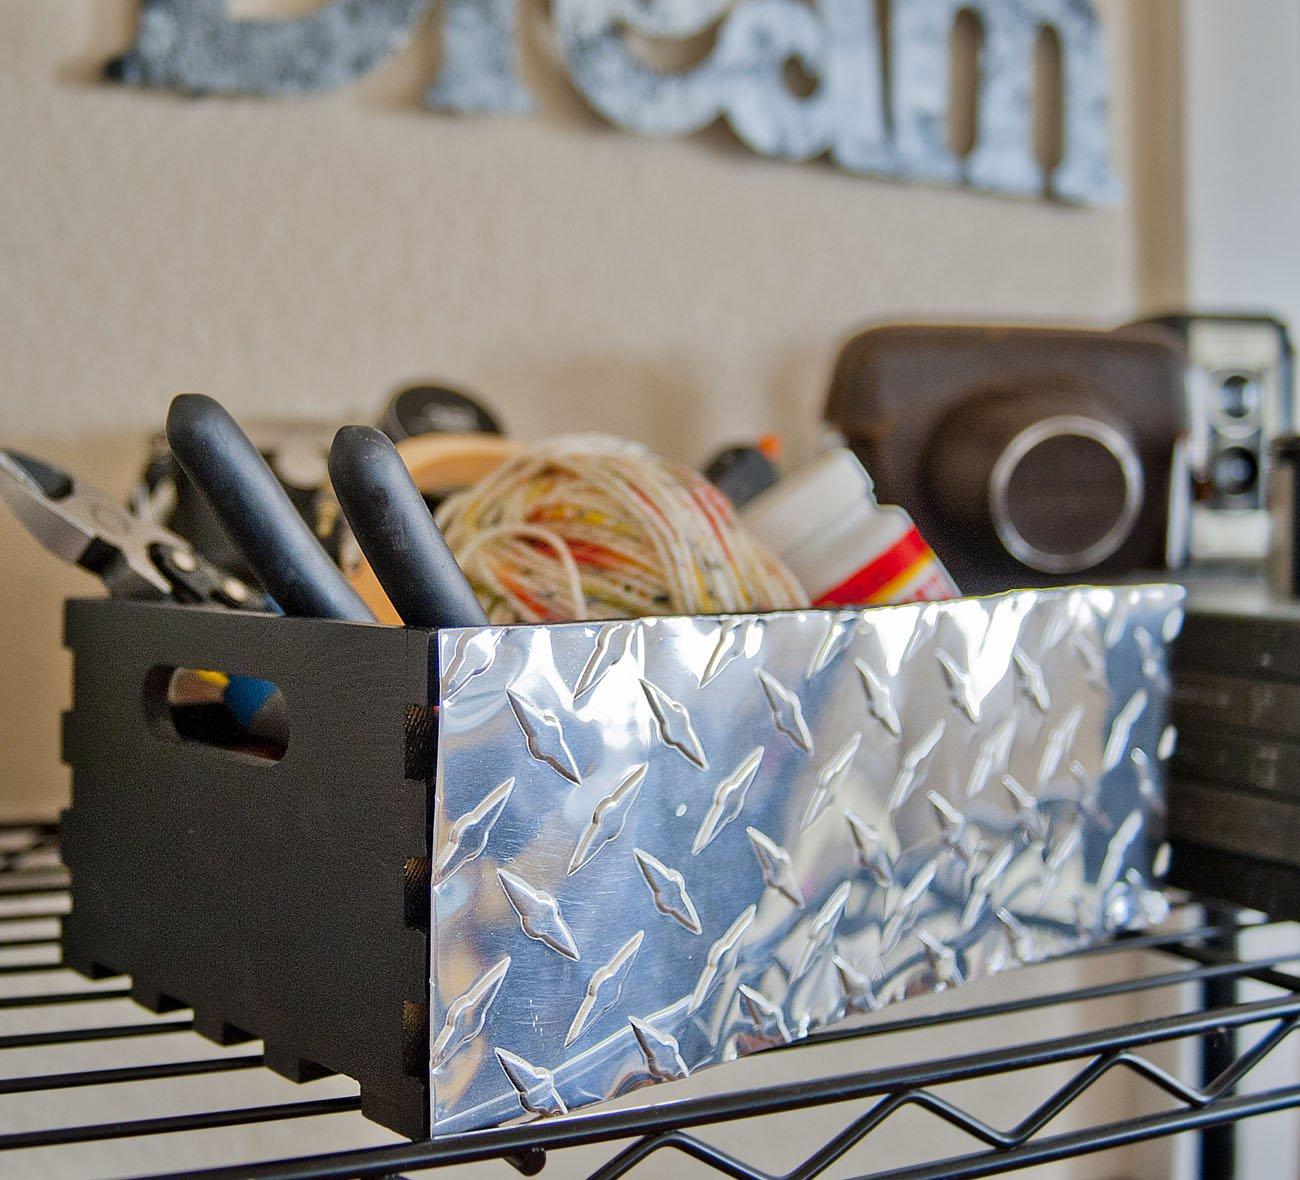 M-D Building Products 57320 Decorative Diamond Tread Aluminum Sheet